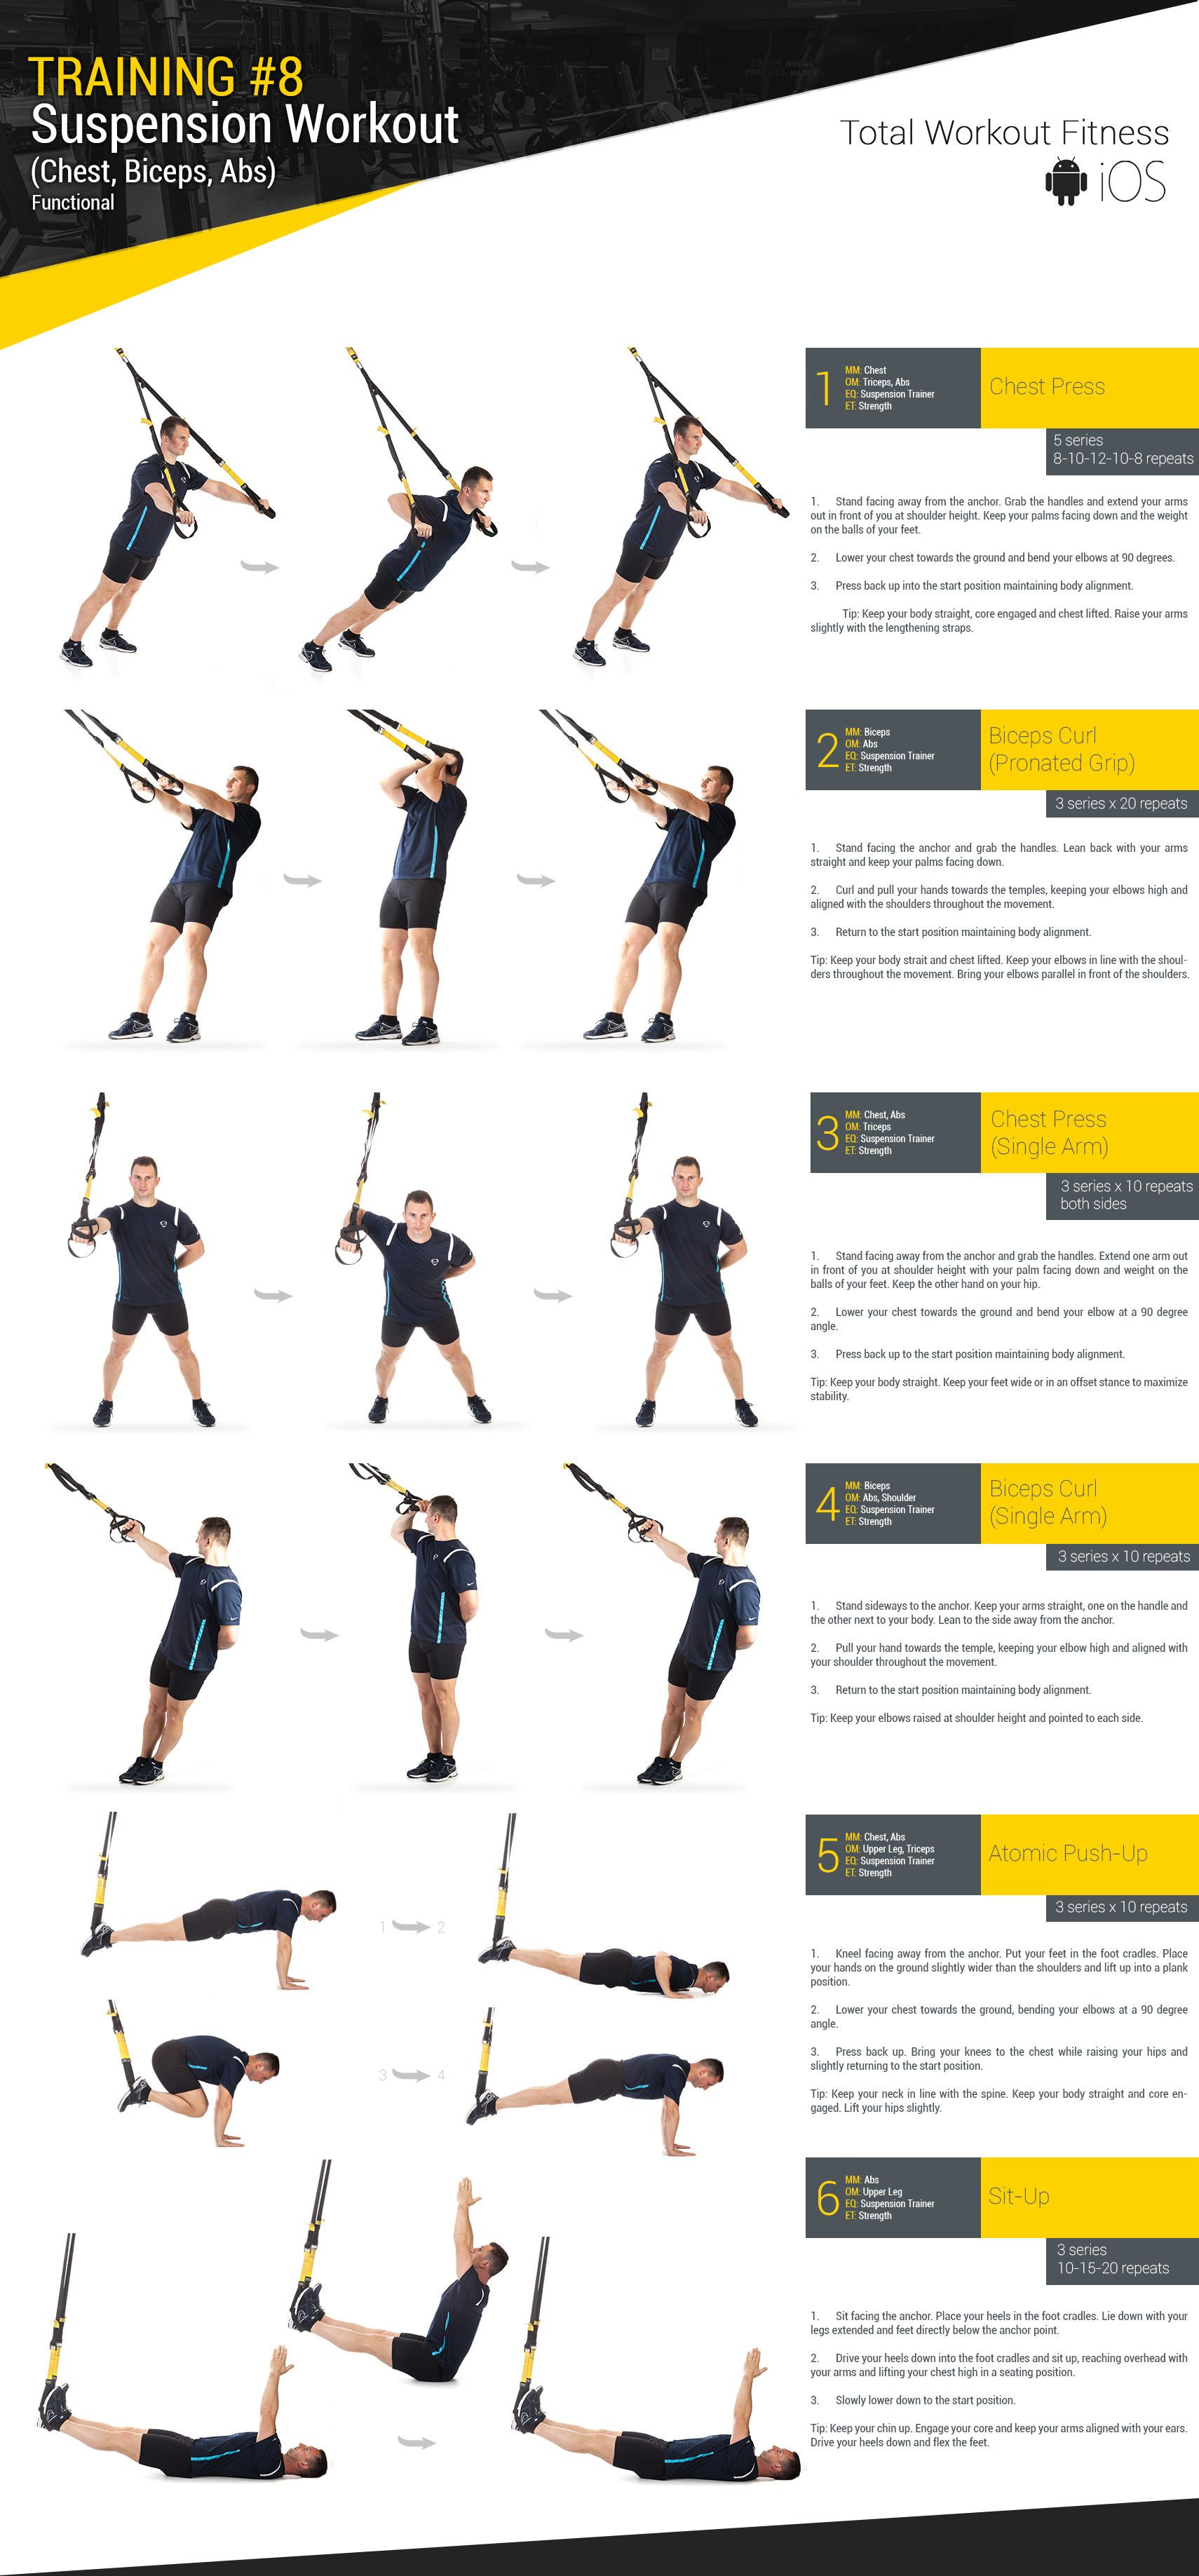 3 point shooting workout pdf